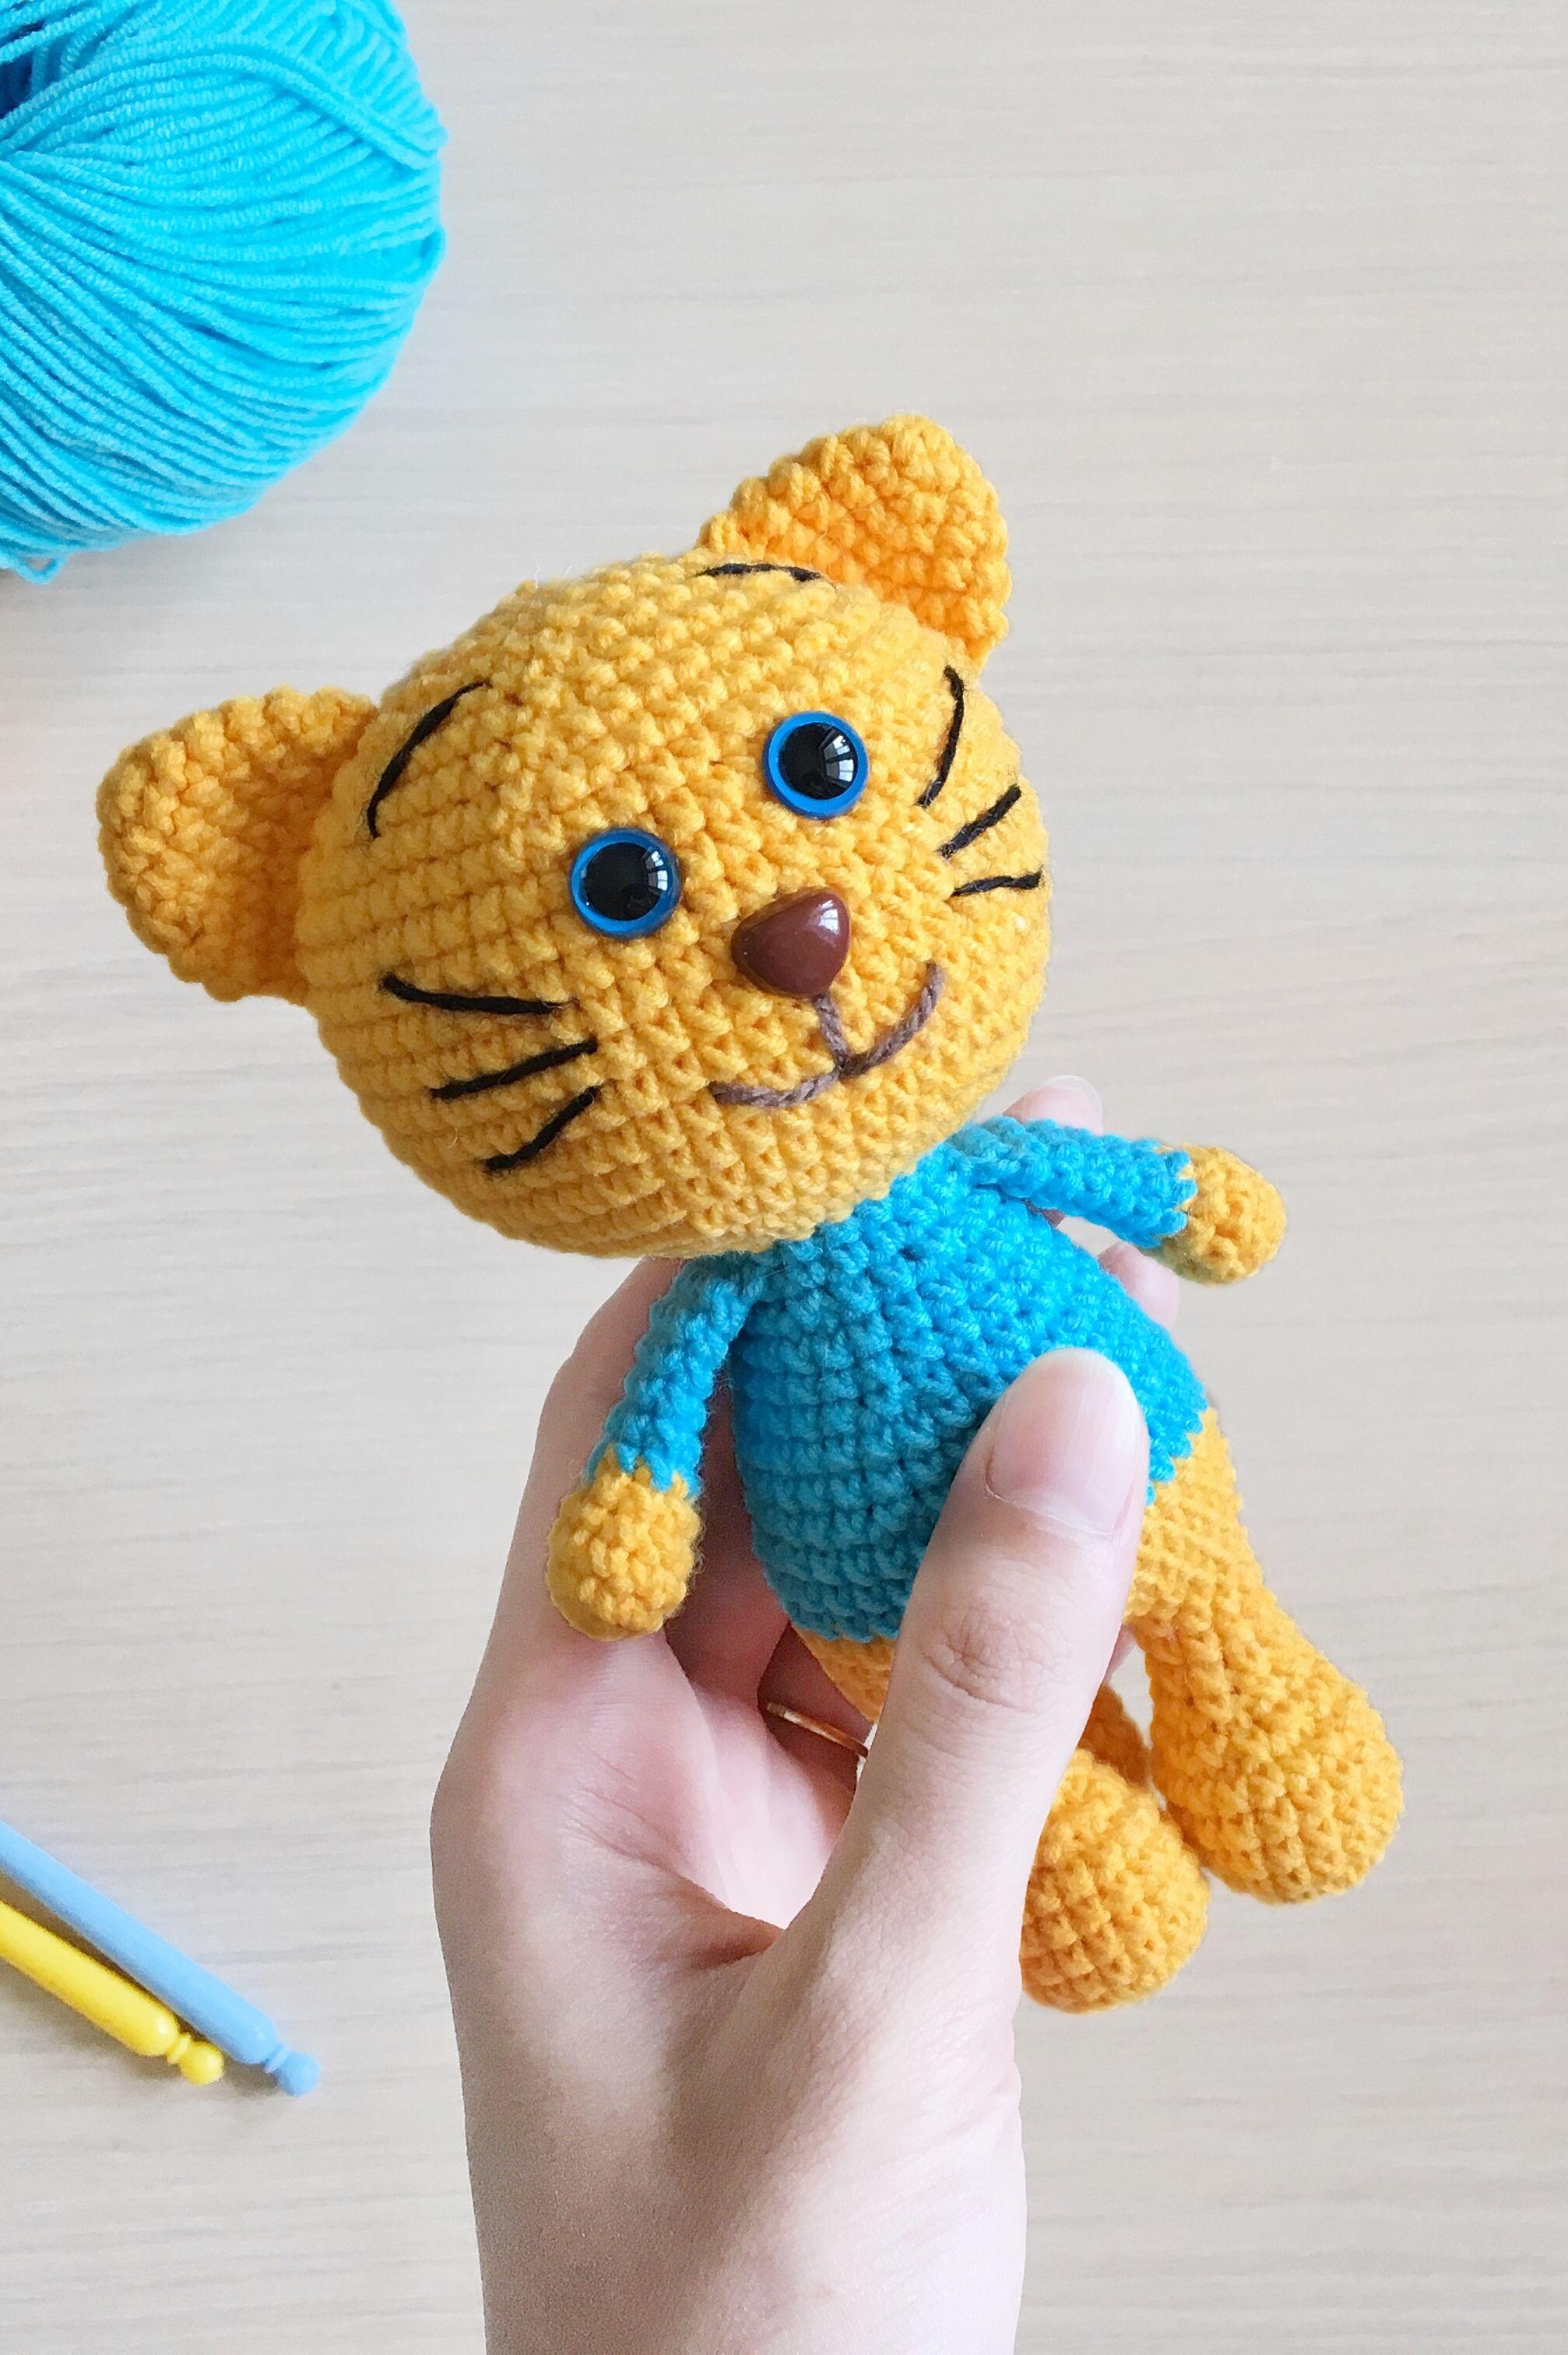 Yellow crochet cat in a blue sweater, Cat stuffed animal